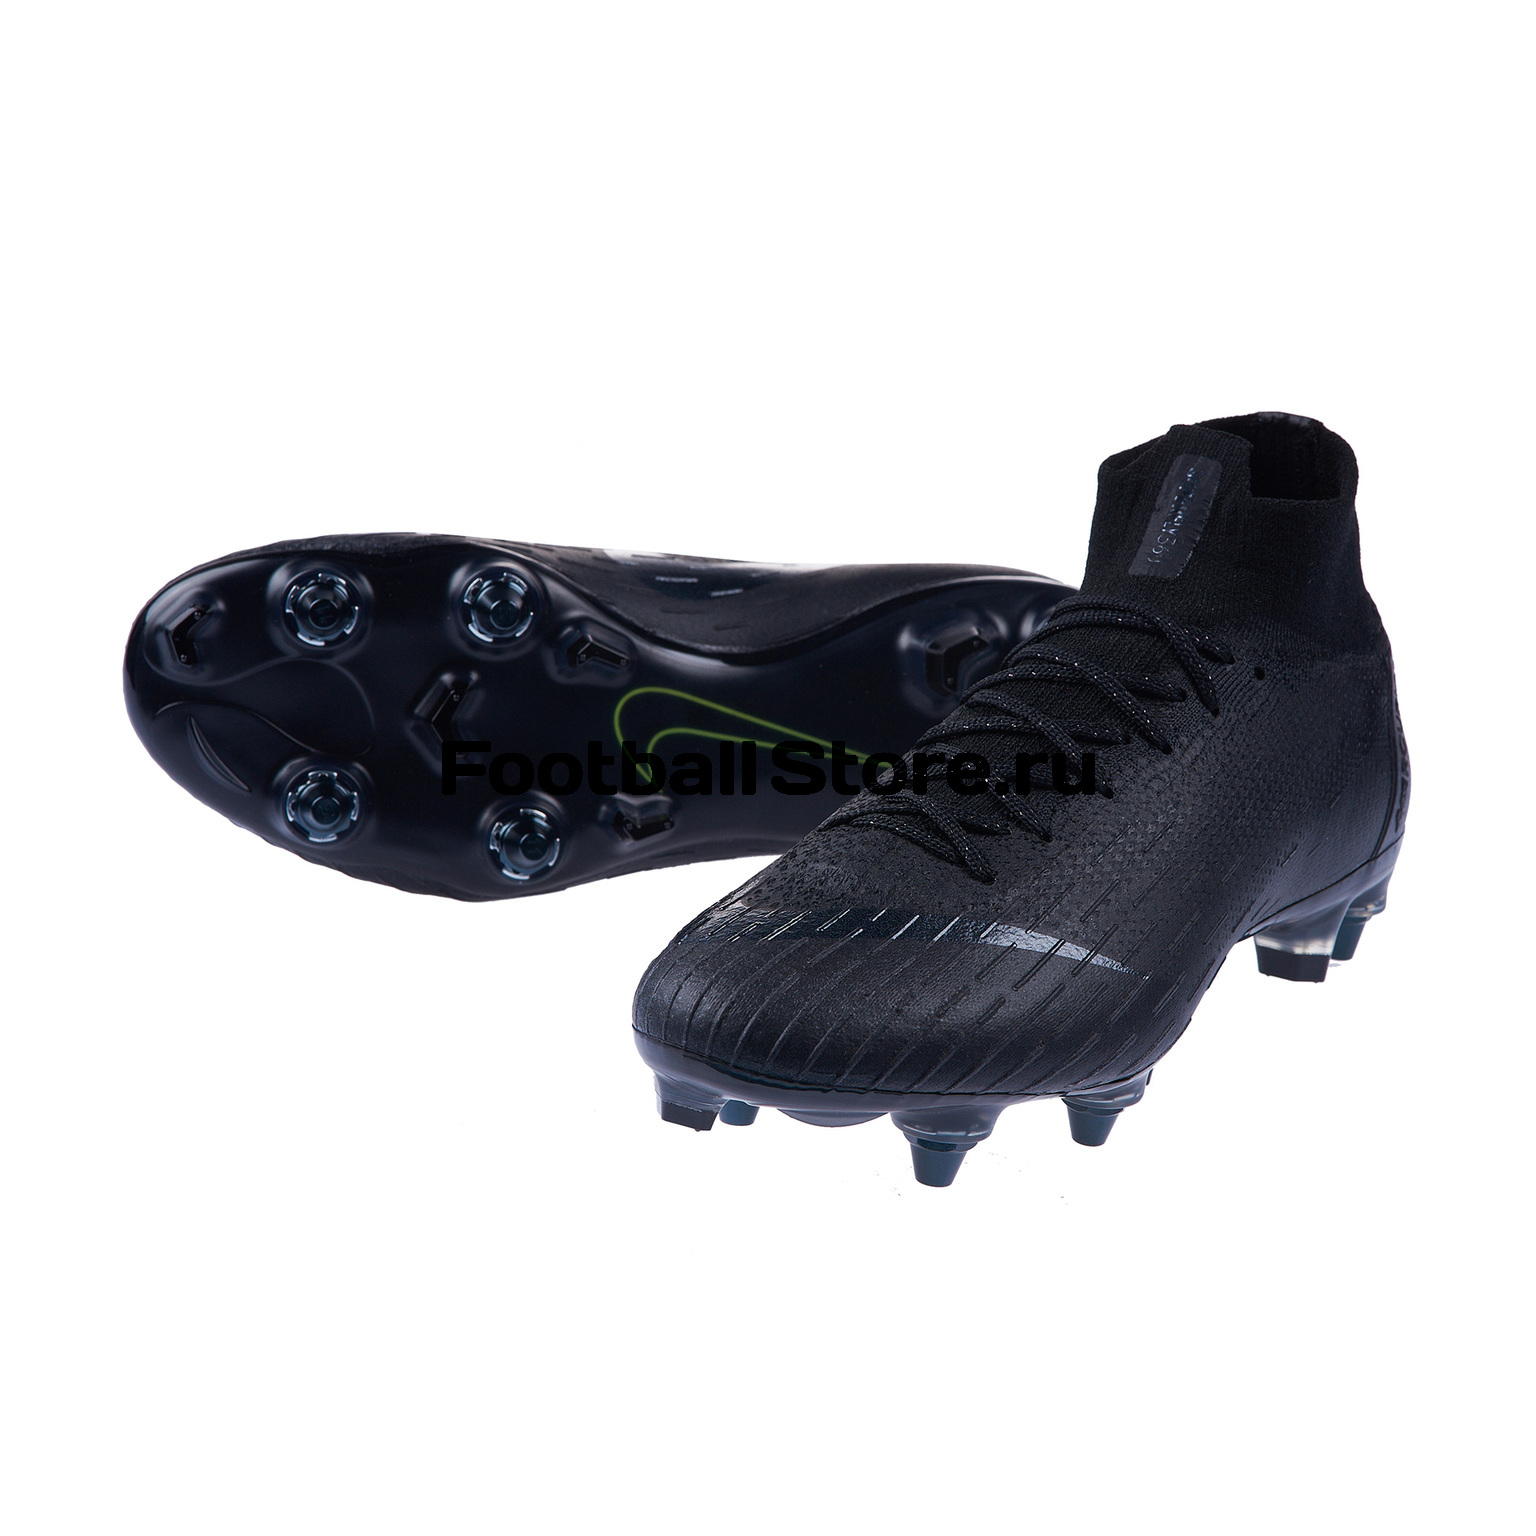 1e02d34c Бутсы Nike Superfly 6 Elite SG-Pro AC AH7366-001 – купить бутсы в ...